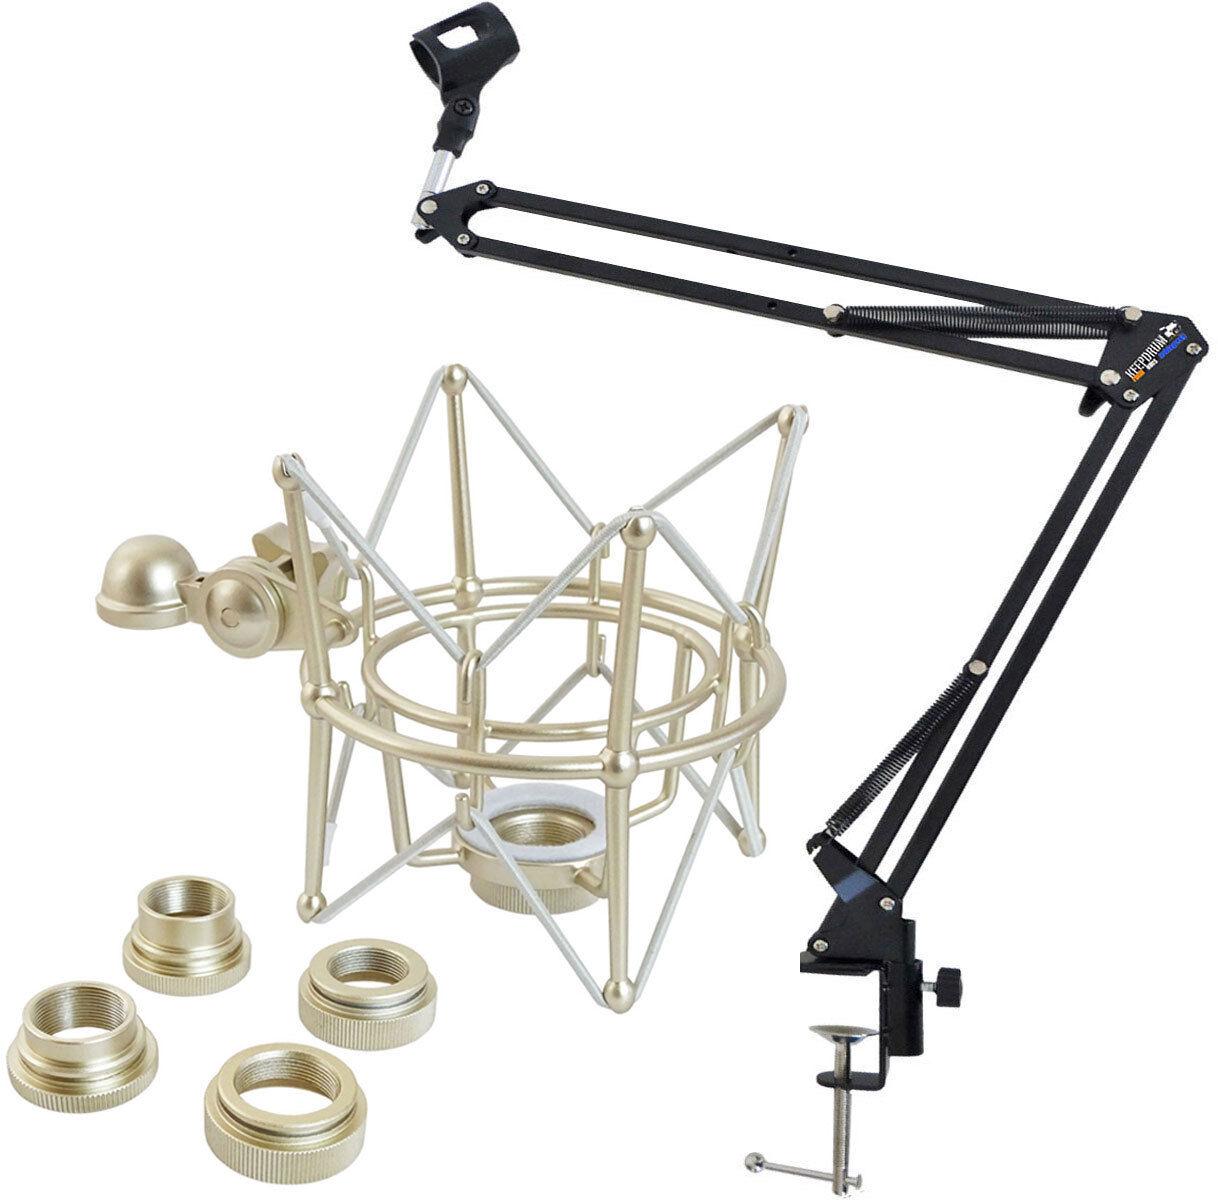 Keepdrum Tisch-Mikrofonarm Gelenkarm-Stativ + Multi-Mikrofonspinne